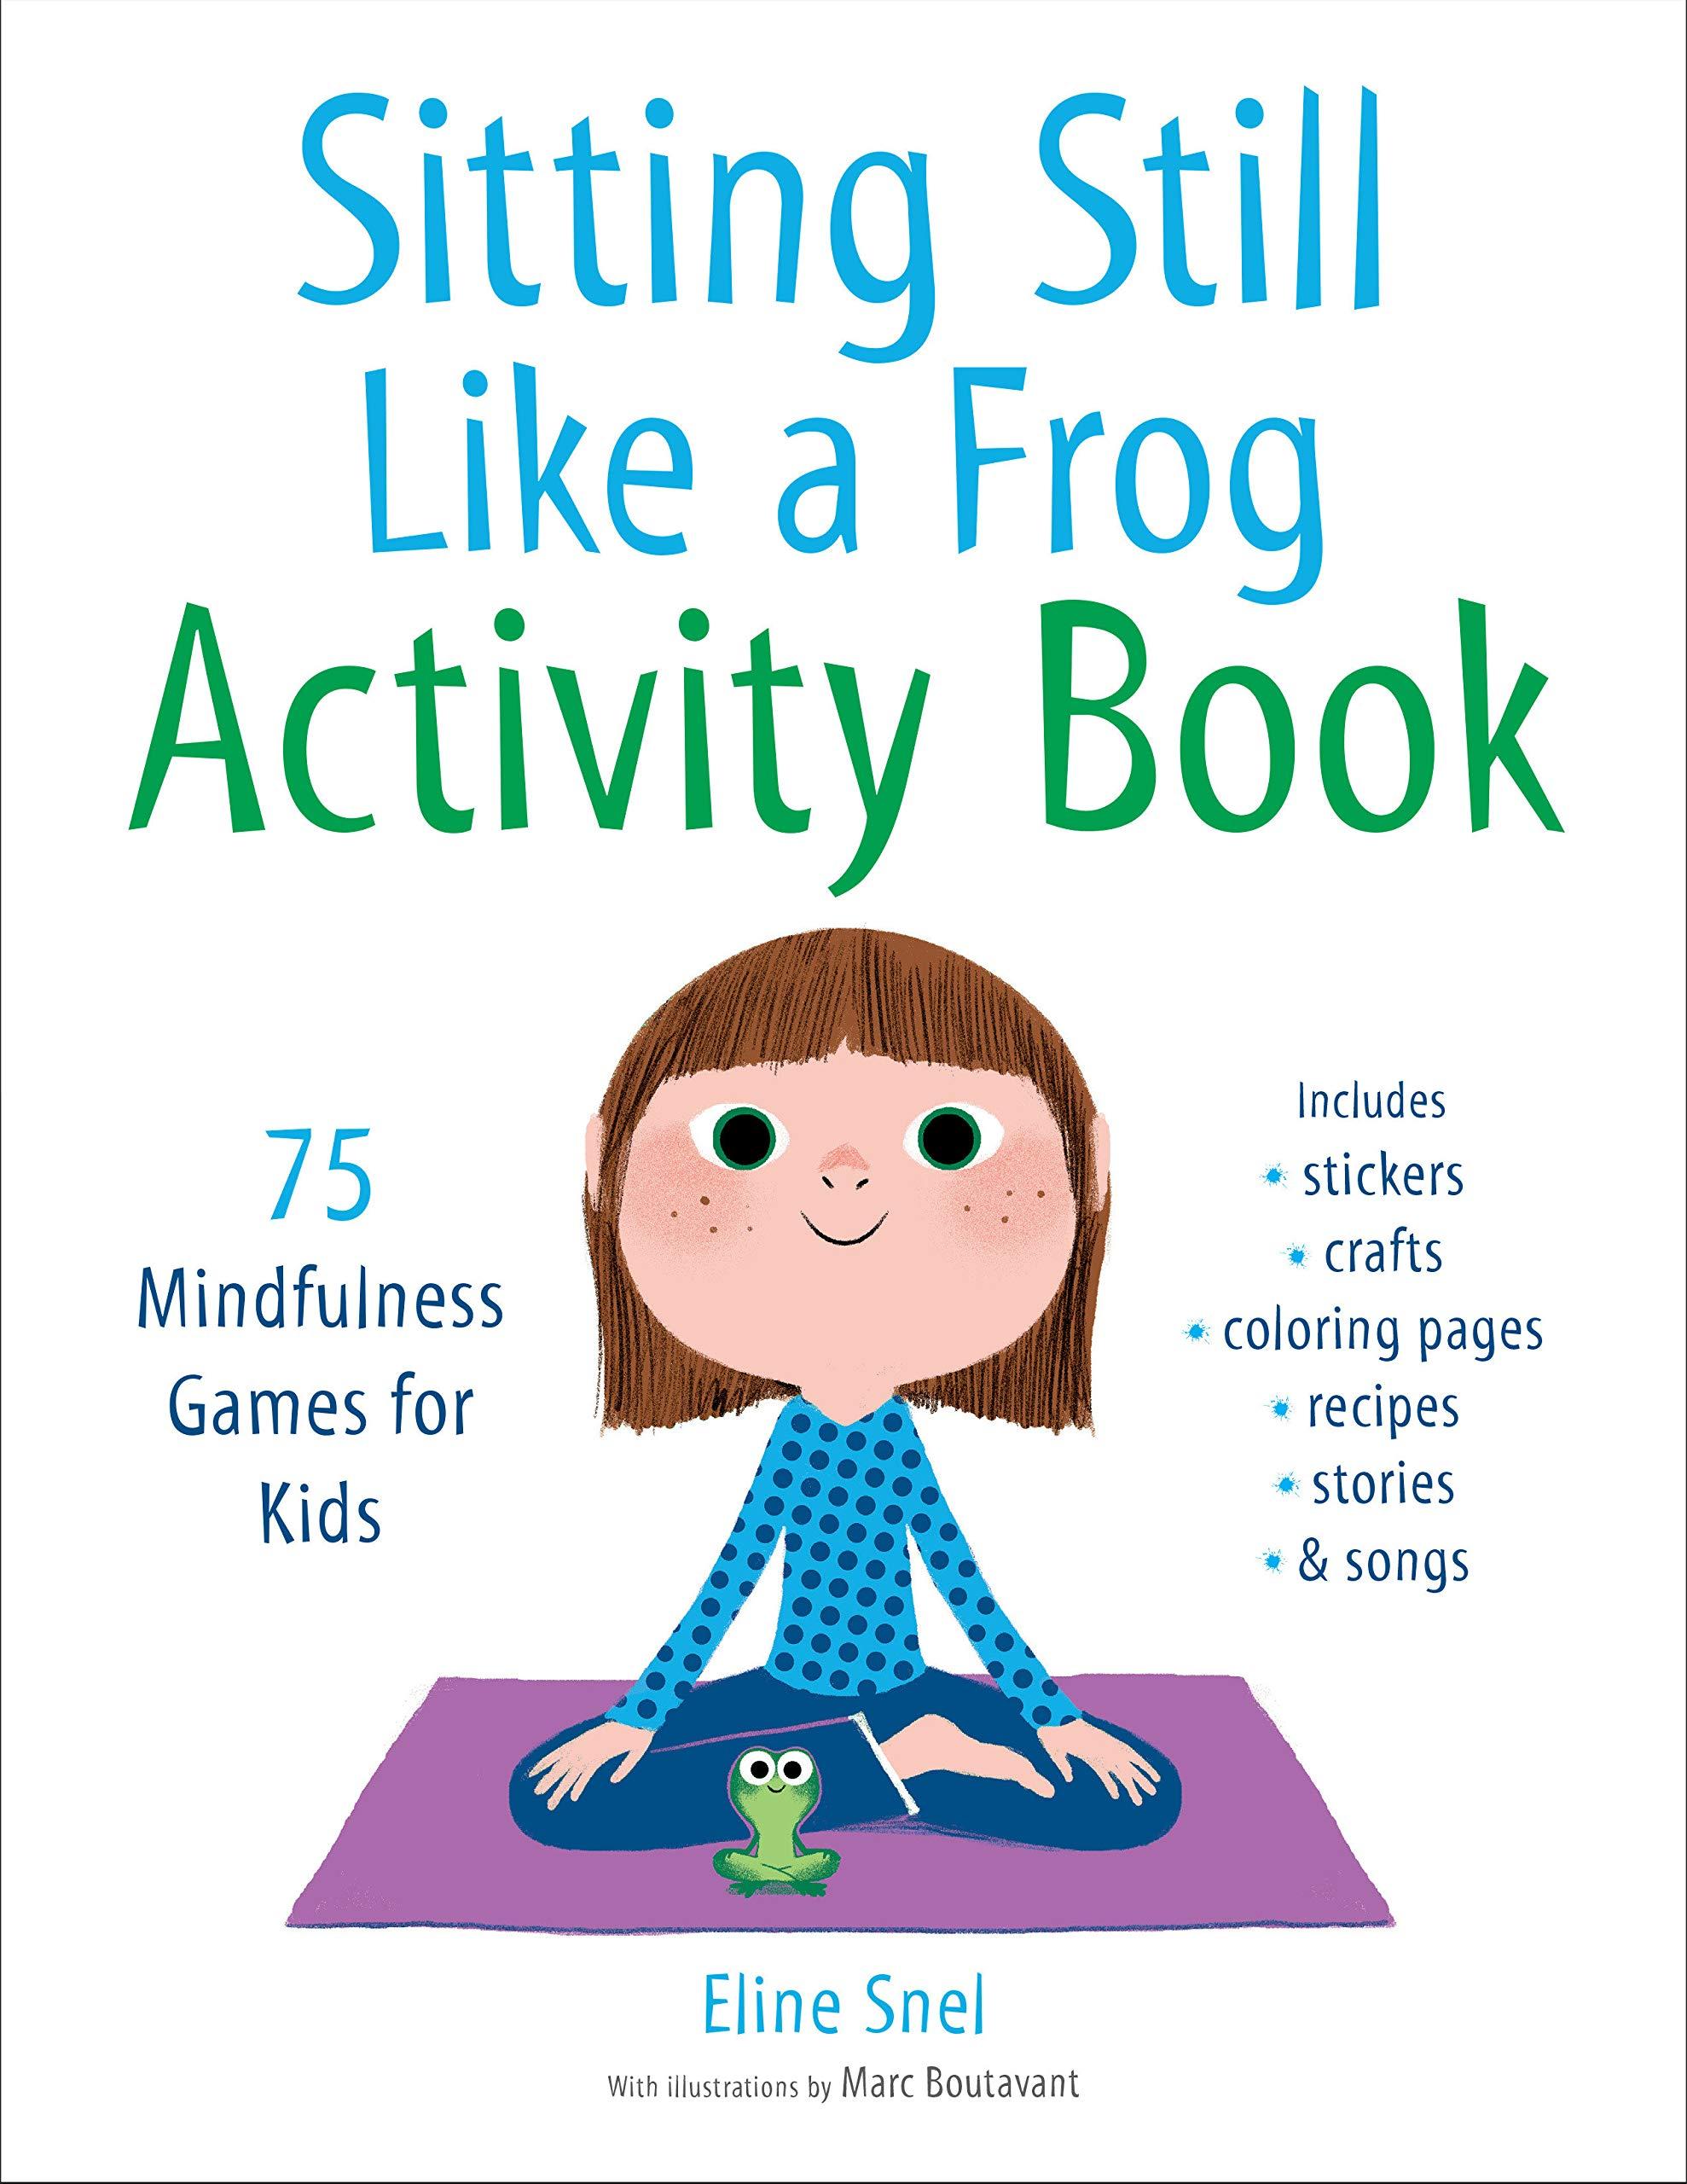 Sitting Still Like A Frog. Activity Book: 75 Mindfulness Games for Kids: Amazon.es: Snel Eline, Snel Eline: Libros en idiomas extranjeros